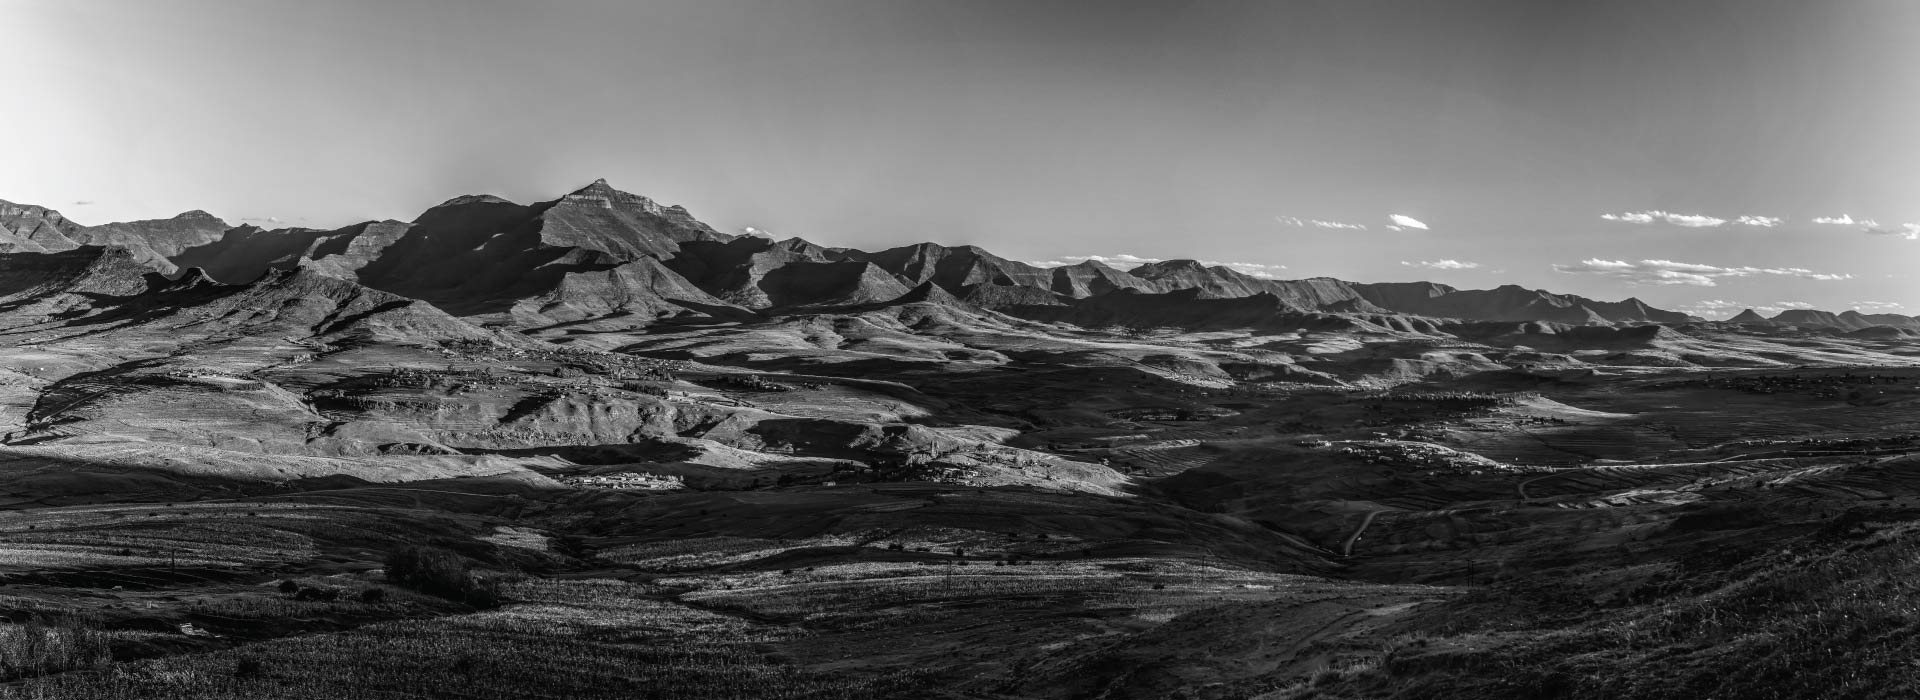 Lesotho Johannesburg mountain range view